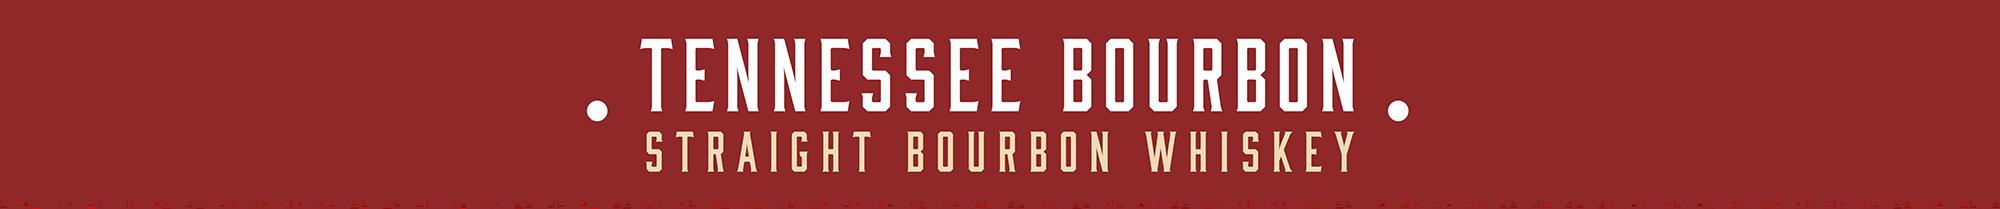 Tennessee Bourbon